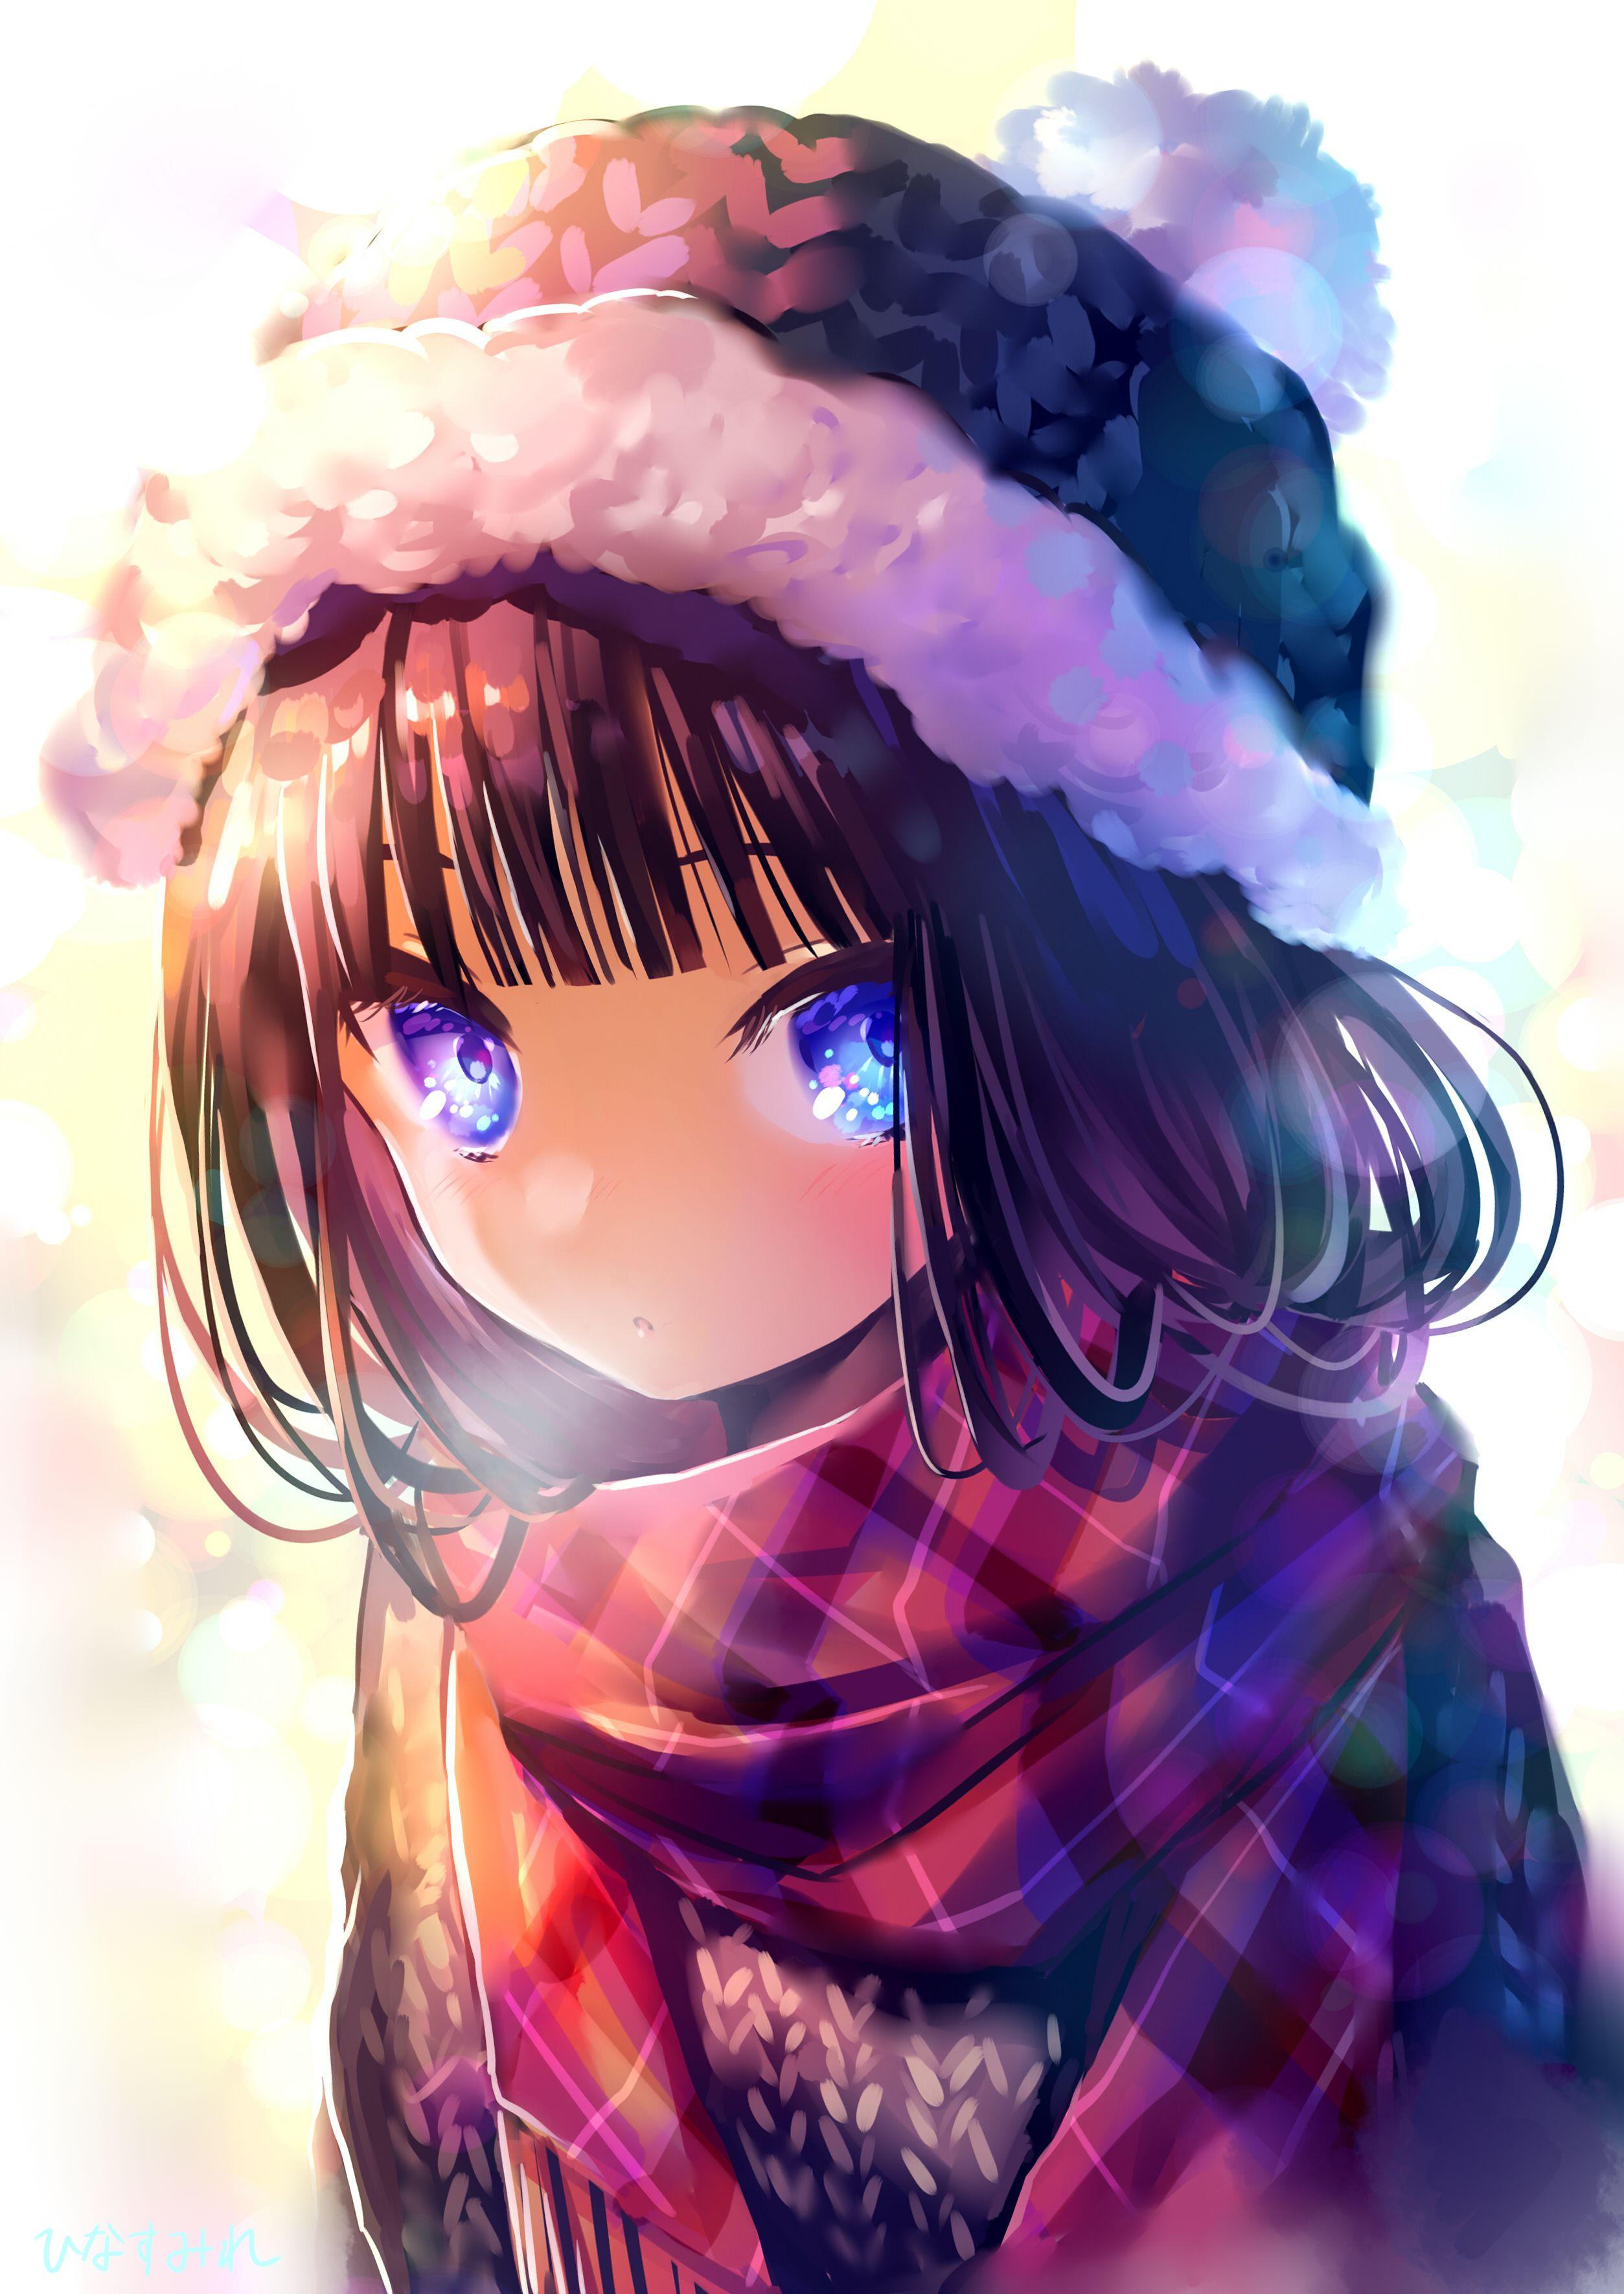 Artist Pixiv Id 10906144 Anime Art Beautiful Anime Christmas Anime Drawings